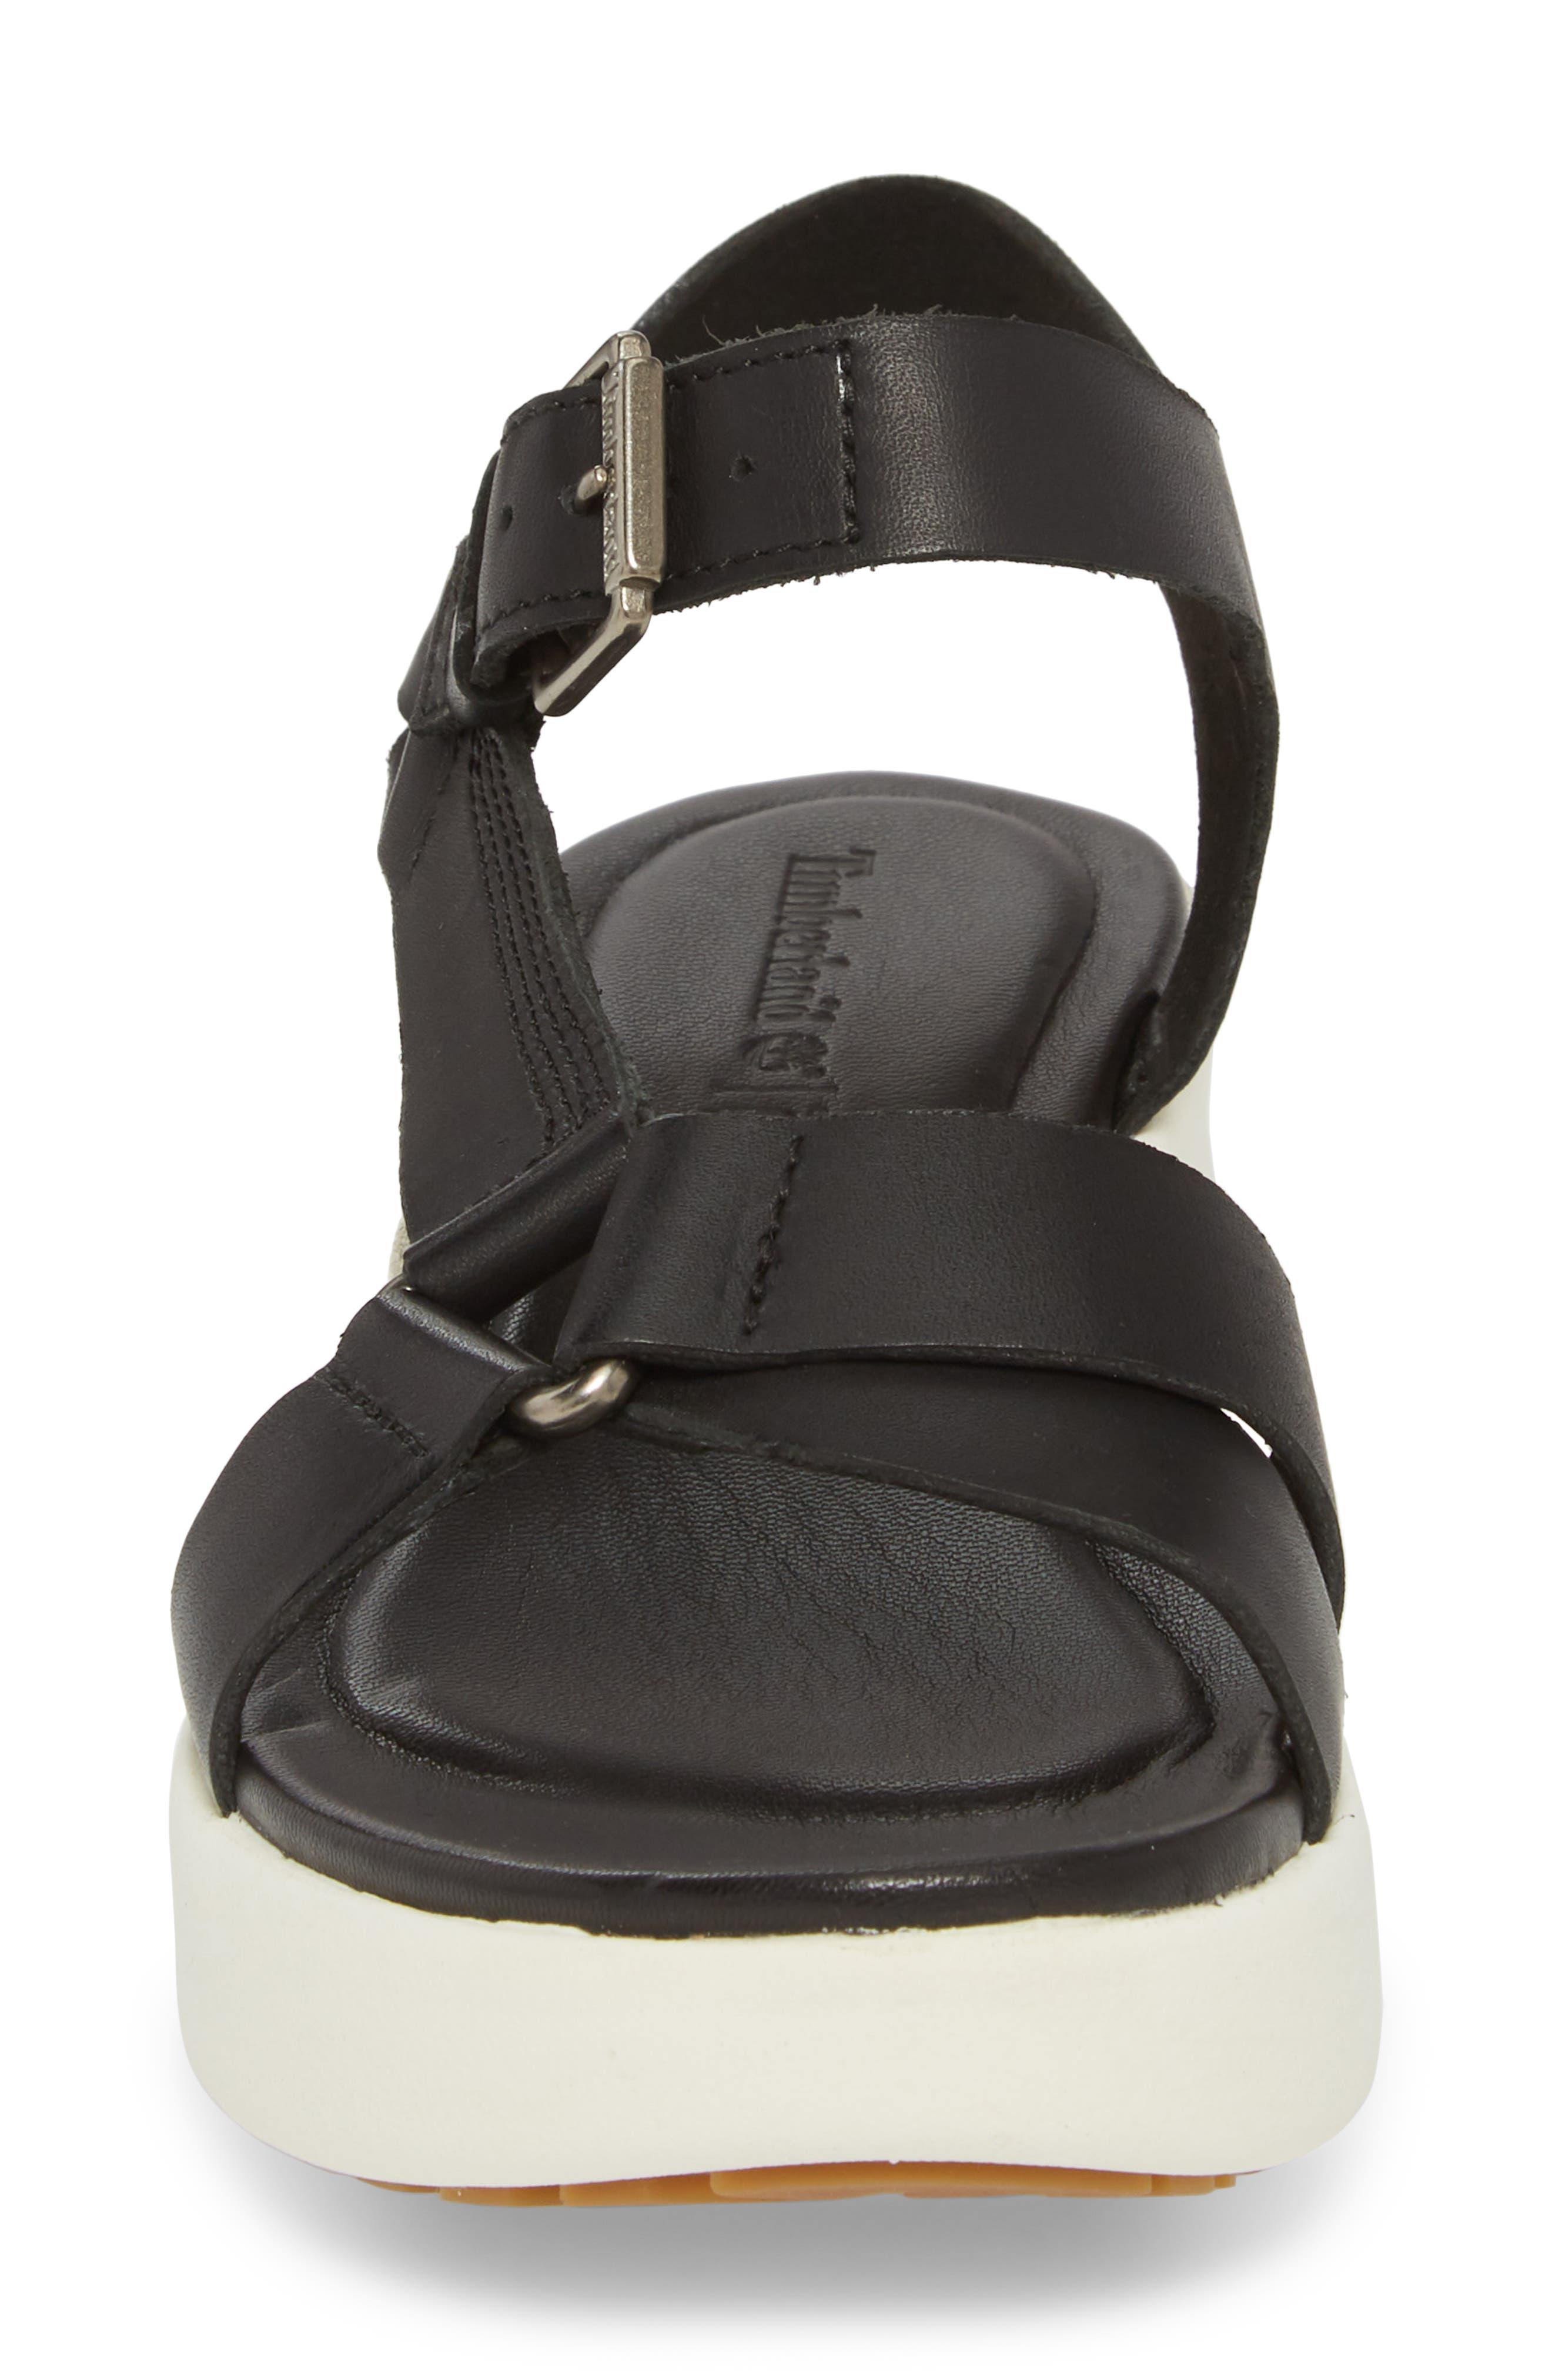 Los Angeles Wind Sport Sandal,                             Alternate thumbnail 4, color,                             Black Leather